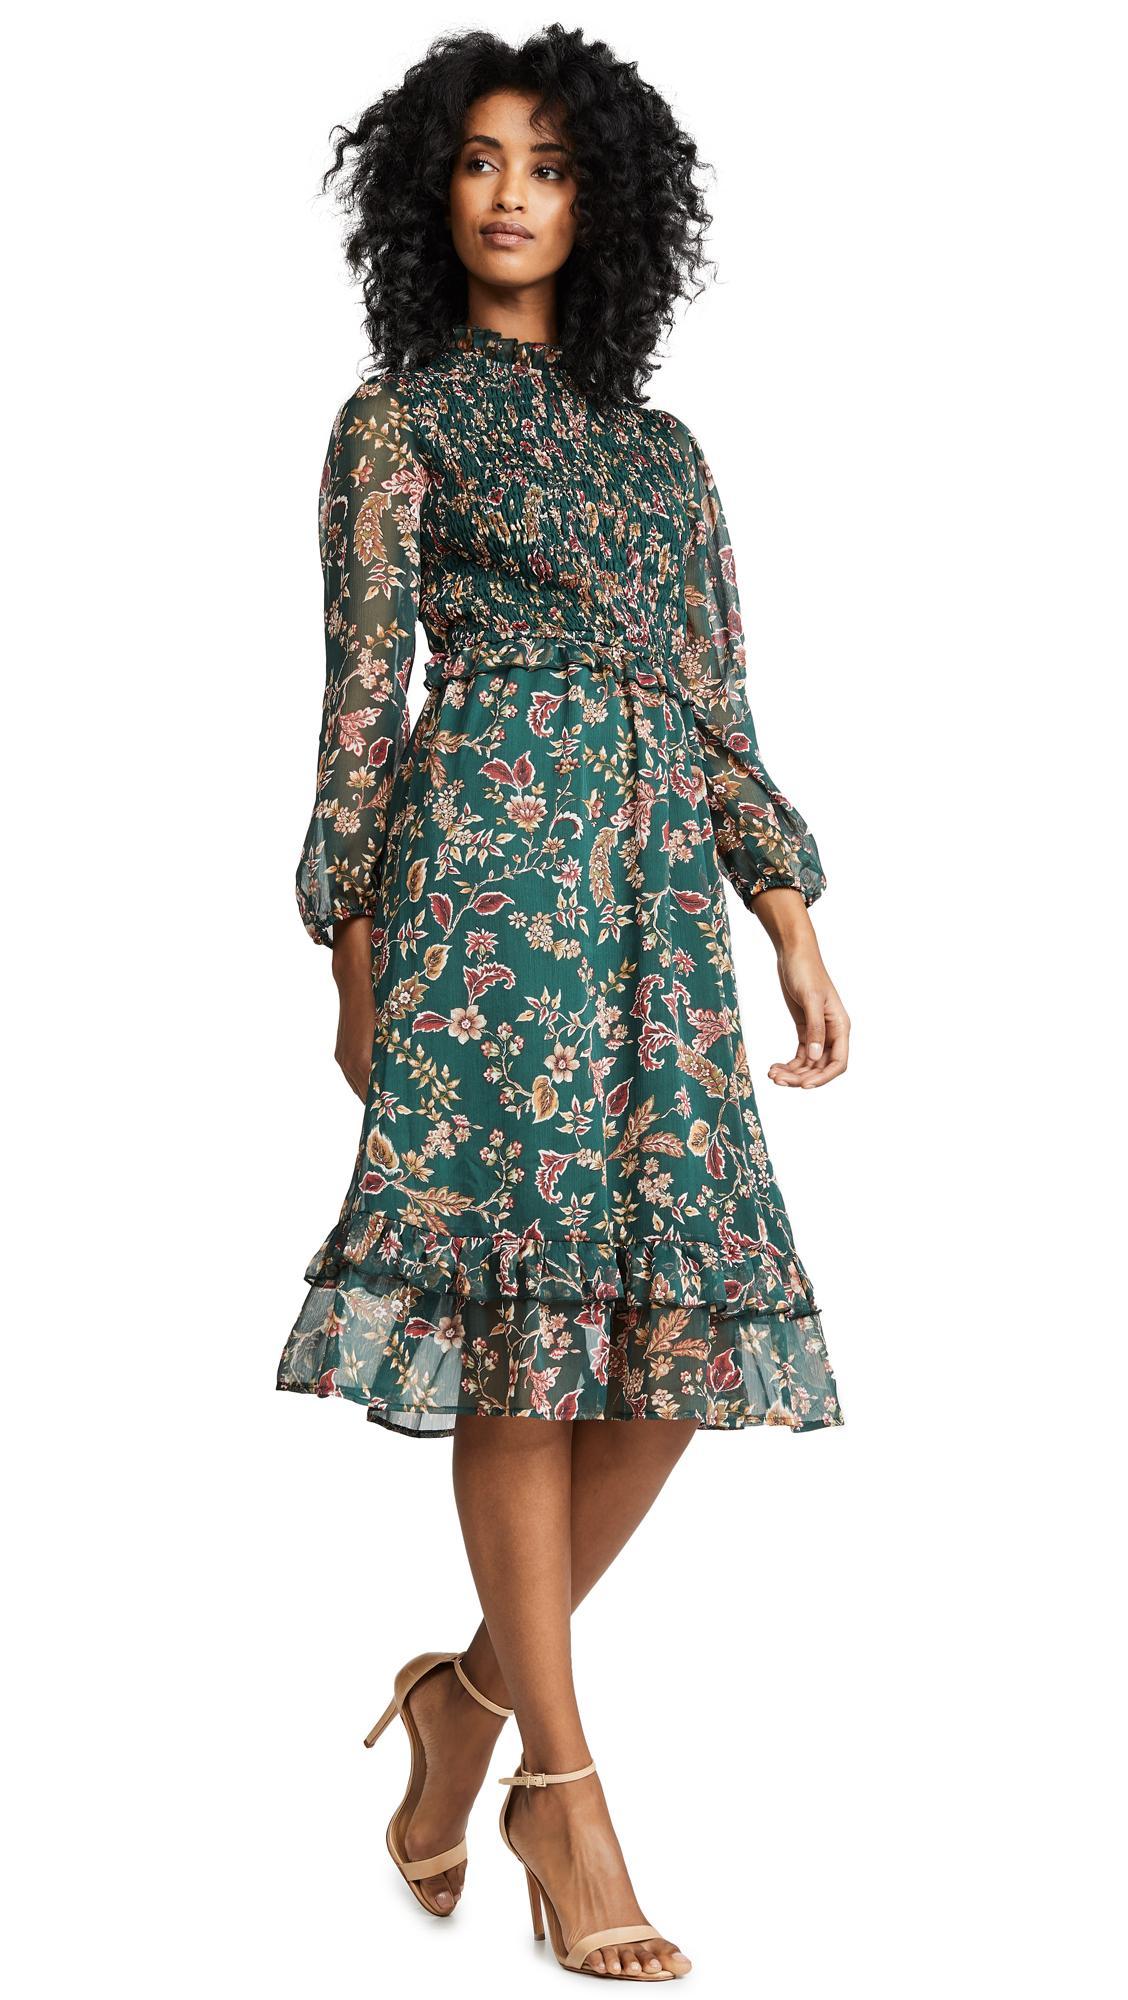 61e4c82df537 Moon River Floral Midi Dress In Pine Paisley